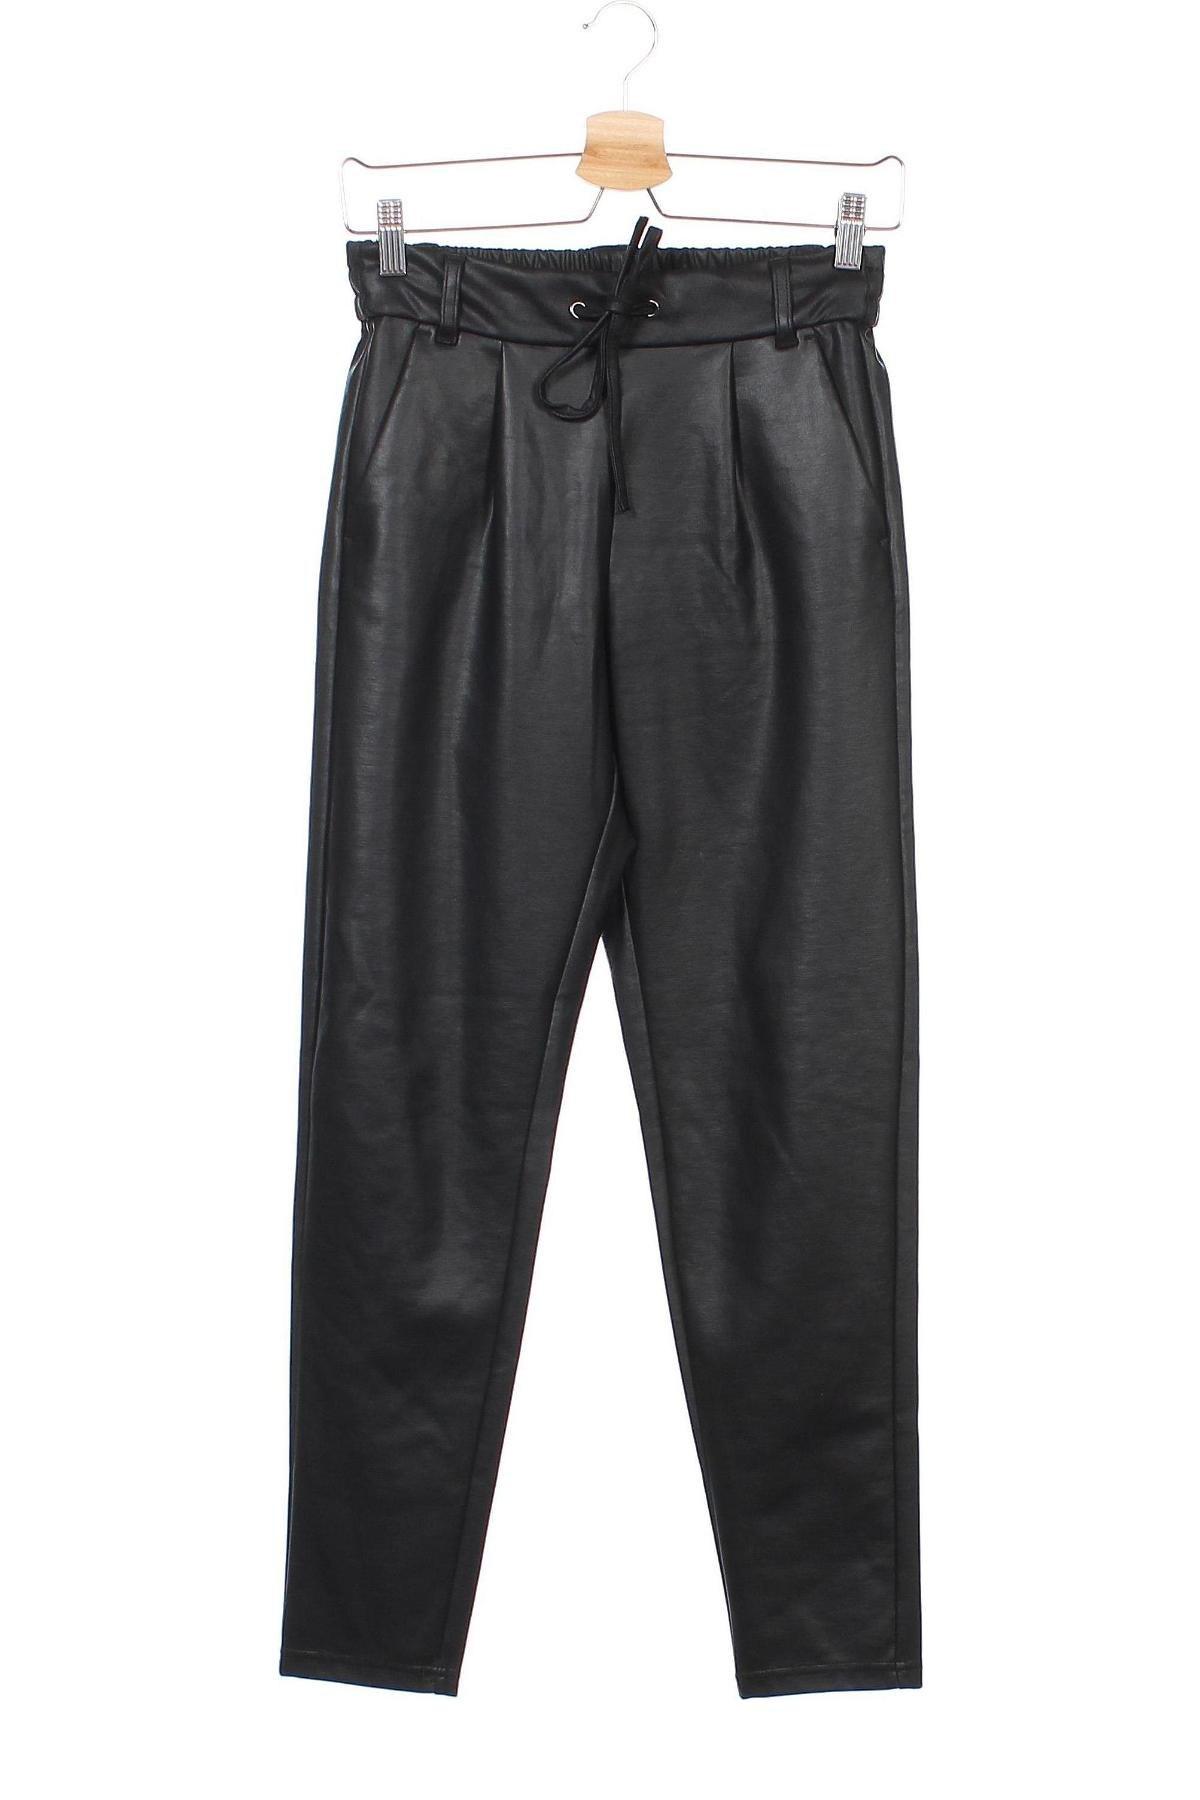 Дамски панталон ONLY, Размер XS, Цвят Черен, 95% полиестер, 5% еластан, Цена 42,00лв.